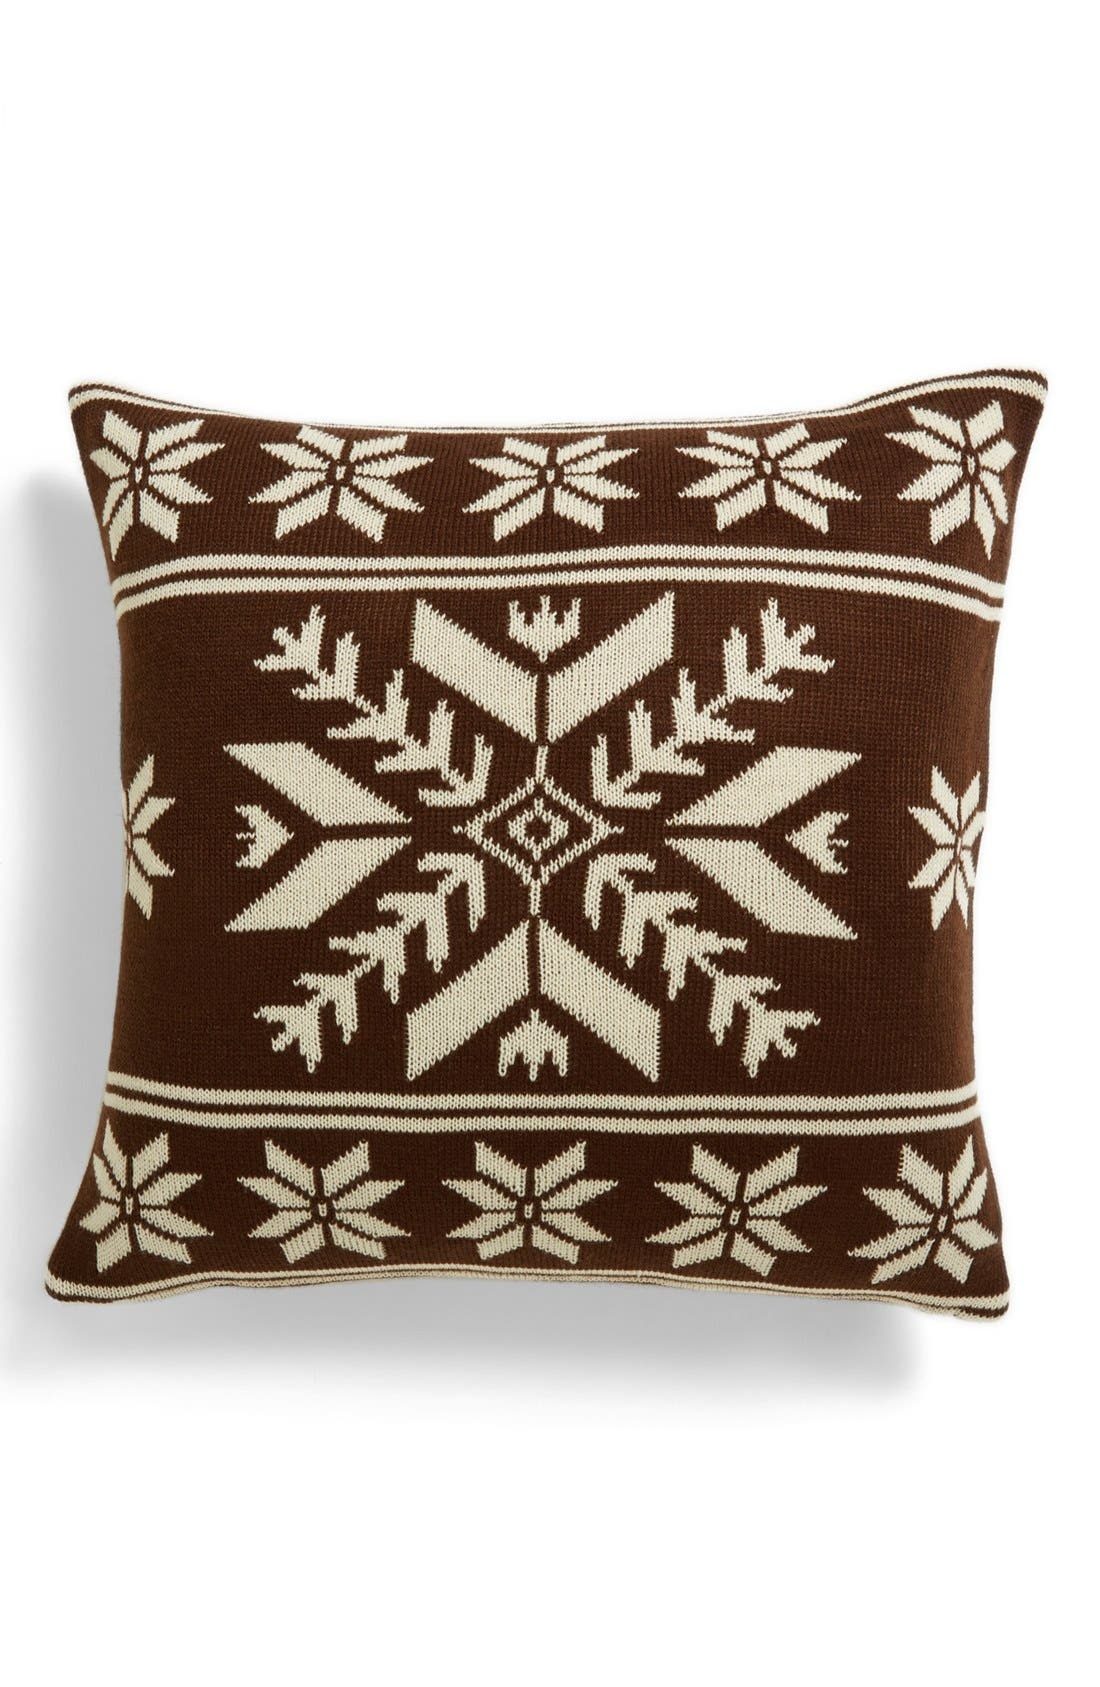 Main Image - Kennebunk Home 'Snowflake' Pillow